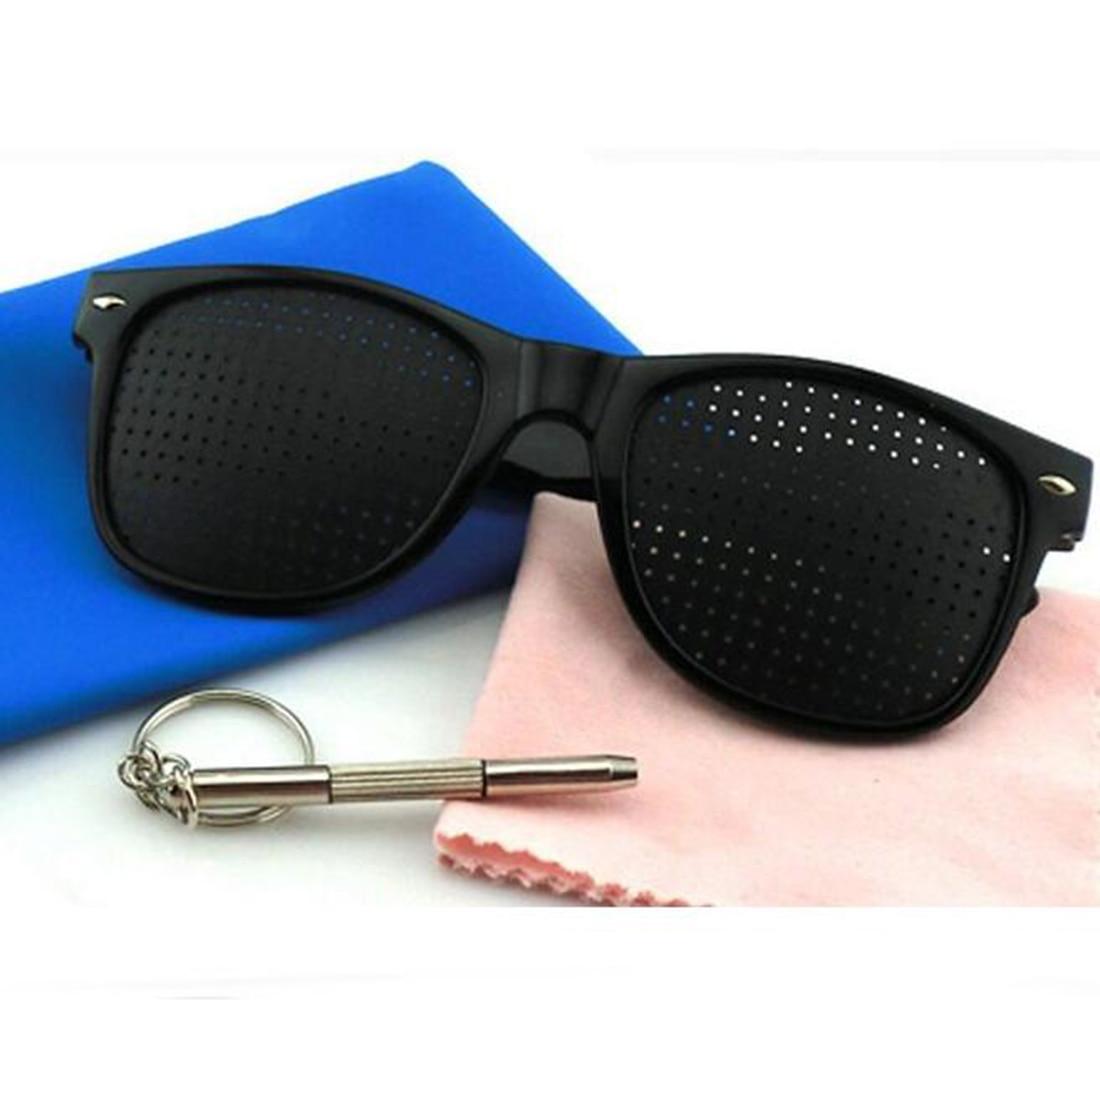 Top Sale Vision Care Pin Hole Sunglasses Men Women Anti-myopia Eye Exercise Improver Glasses Eyesight Natural Stenopeic Glasses